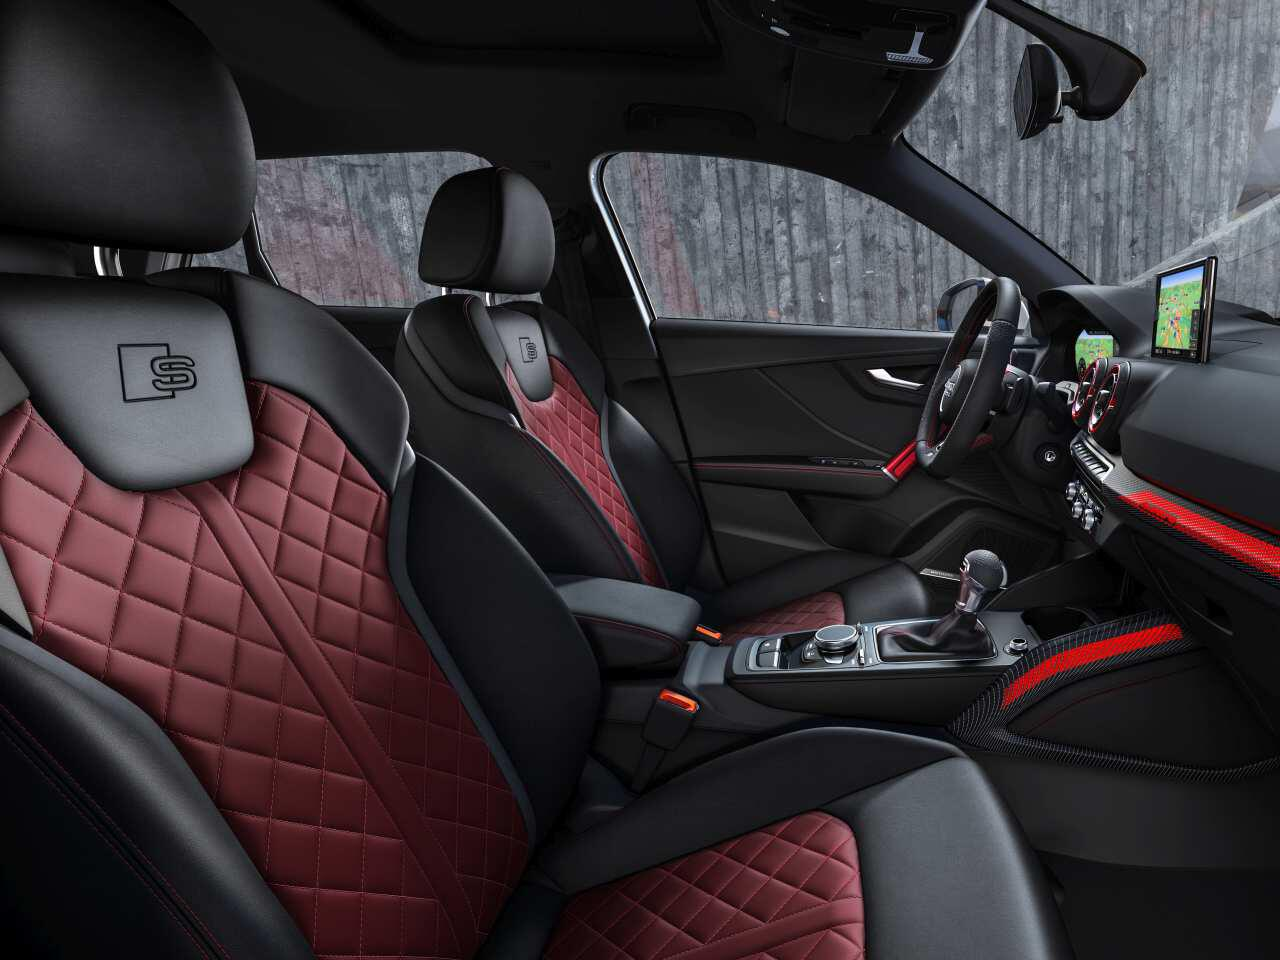 Bild zu Audi SQ2 Innenraum